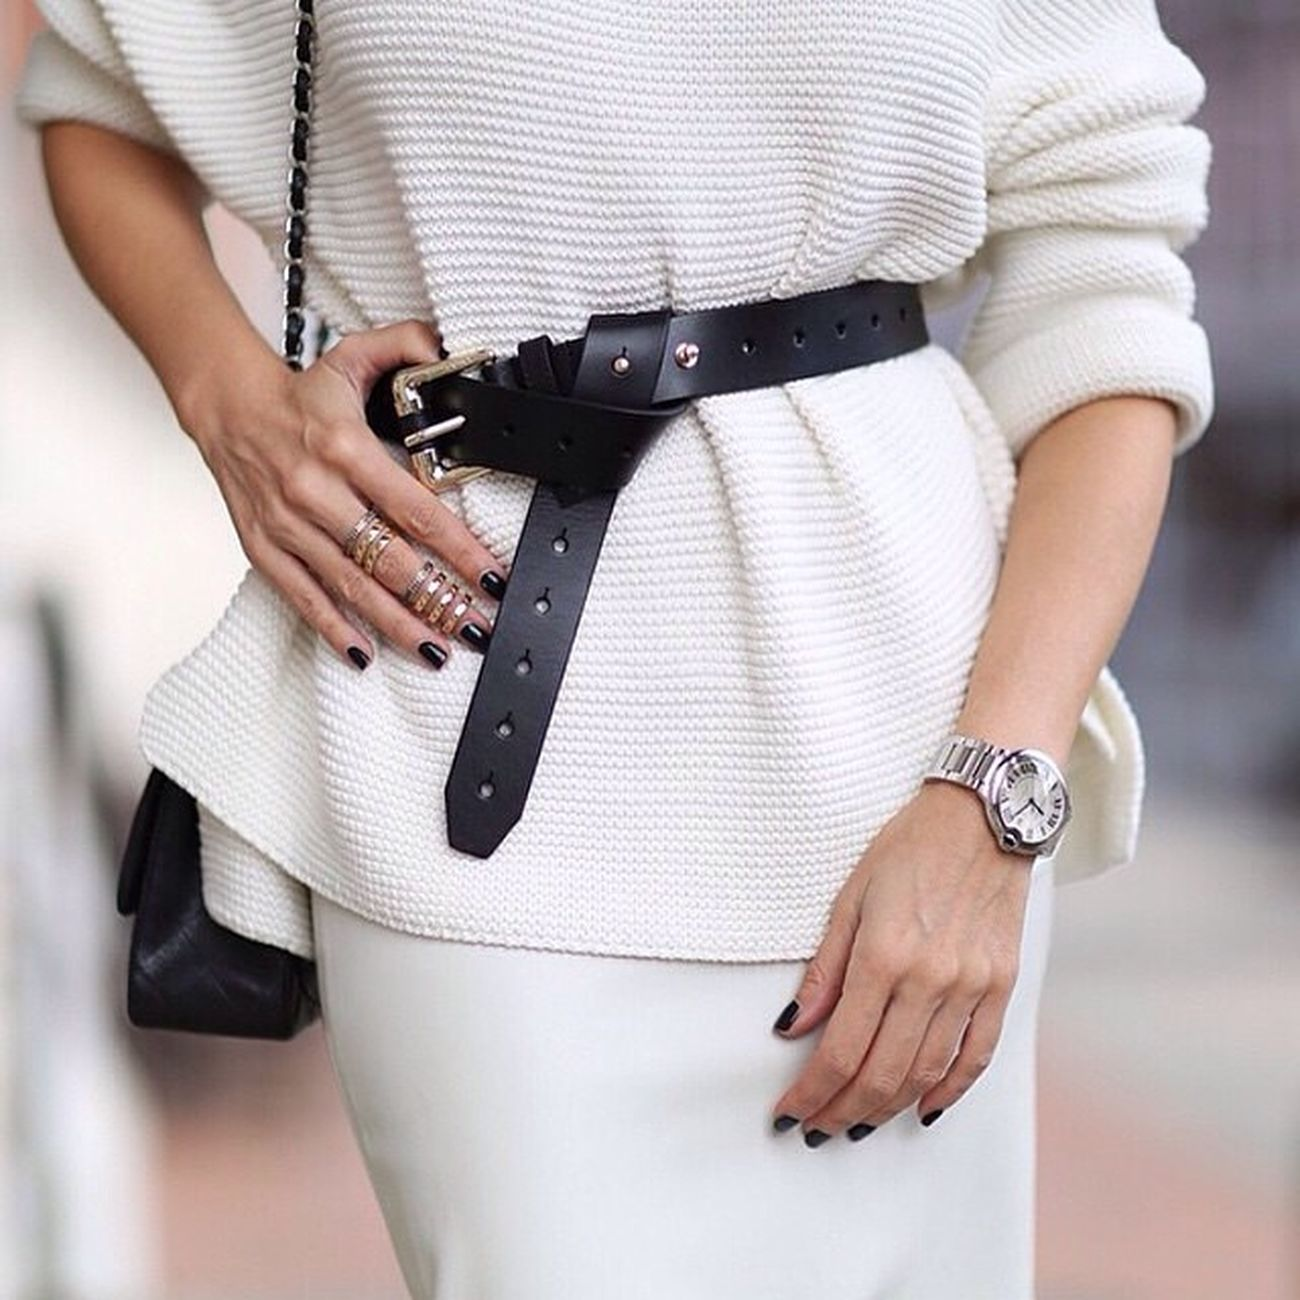 Repost from @senstylable Courtesy of @zara_international Fashion Style Instafashion Instastyle blog blogger instablog instablogger fashionblog fashionblogger igers all_shots tagsforlikes likeit love like instalove instalike white winter winter2015